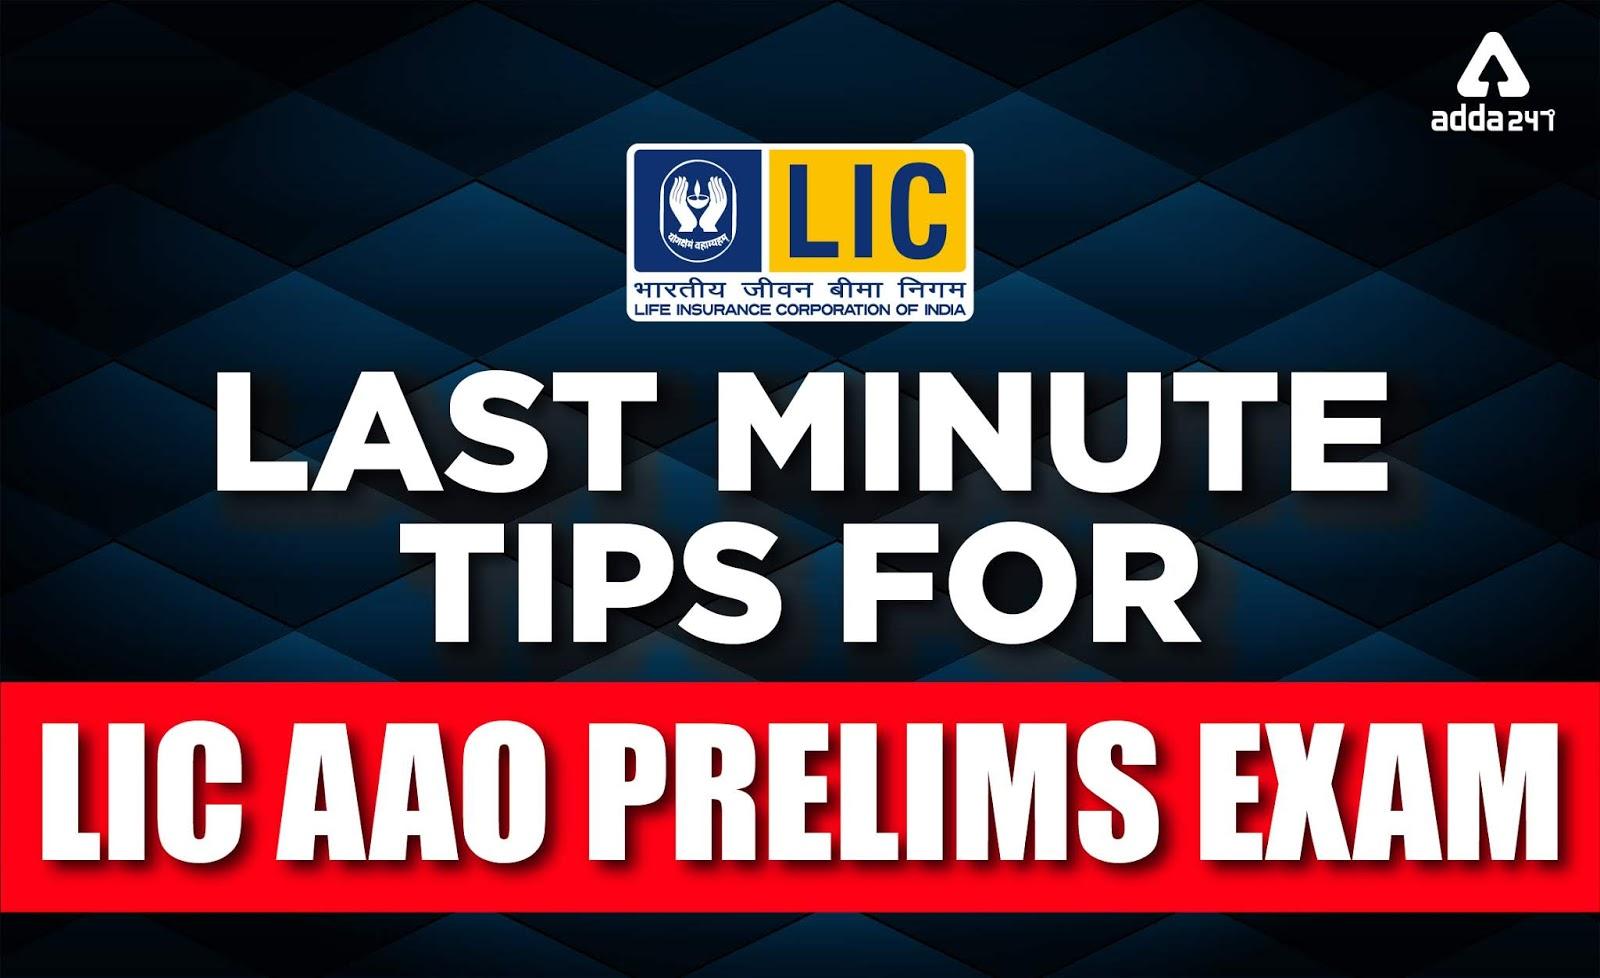 Last-Minute-Tips-For-LIC-AAO-Exam-2019